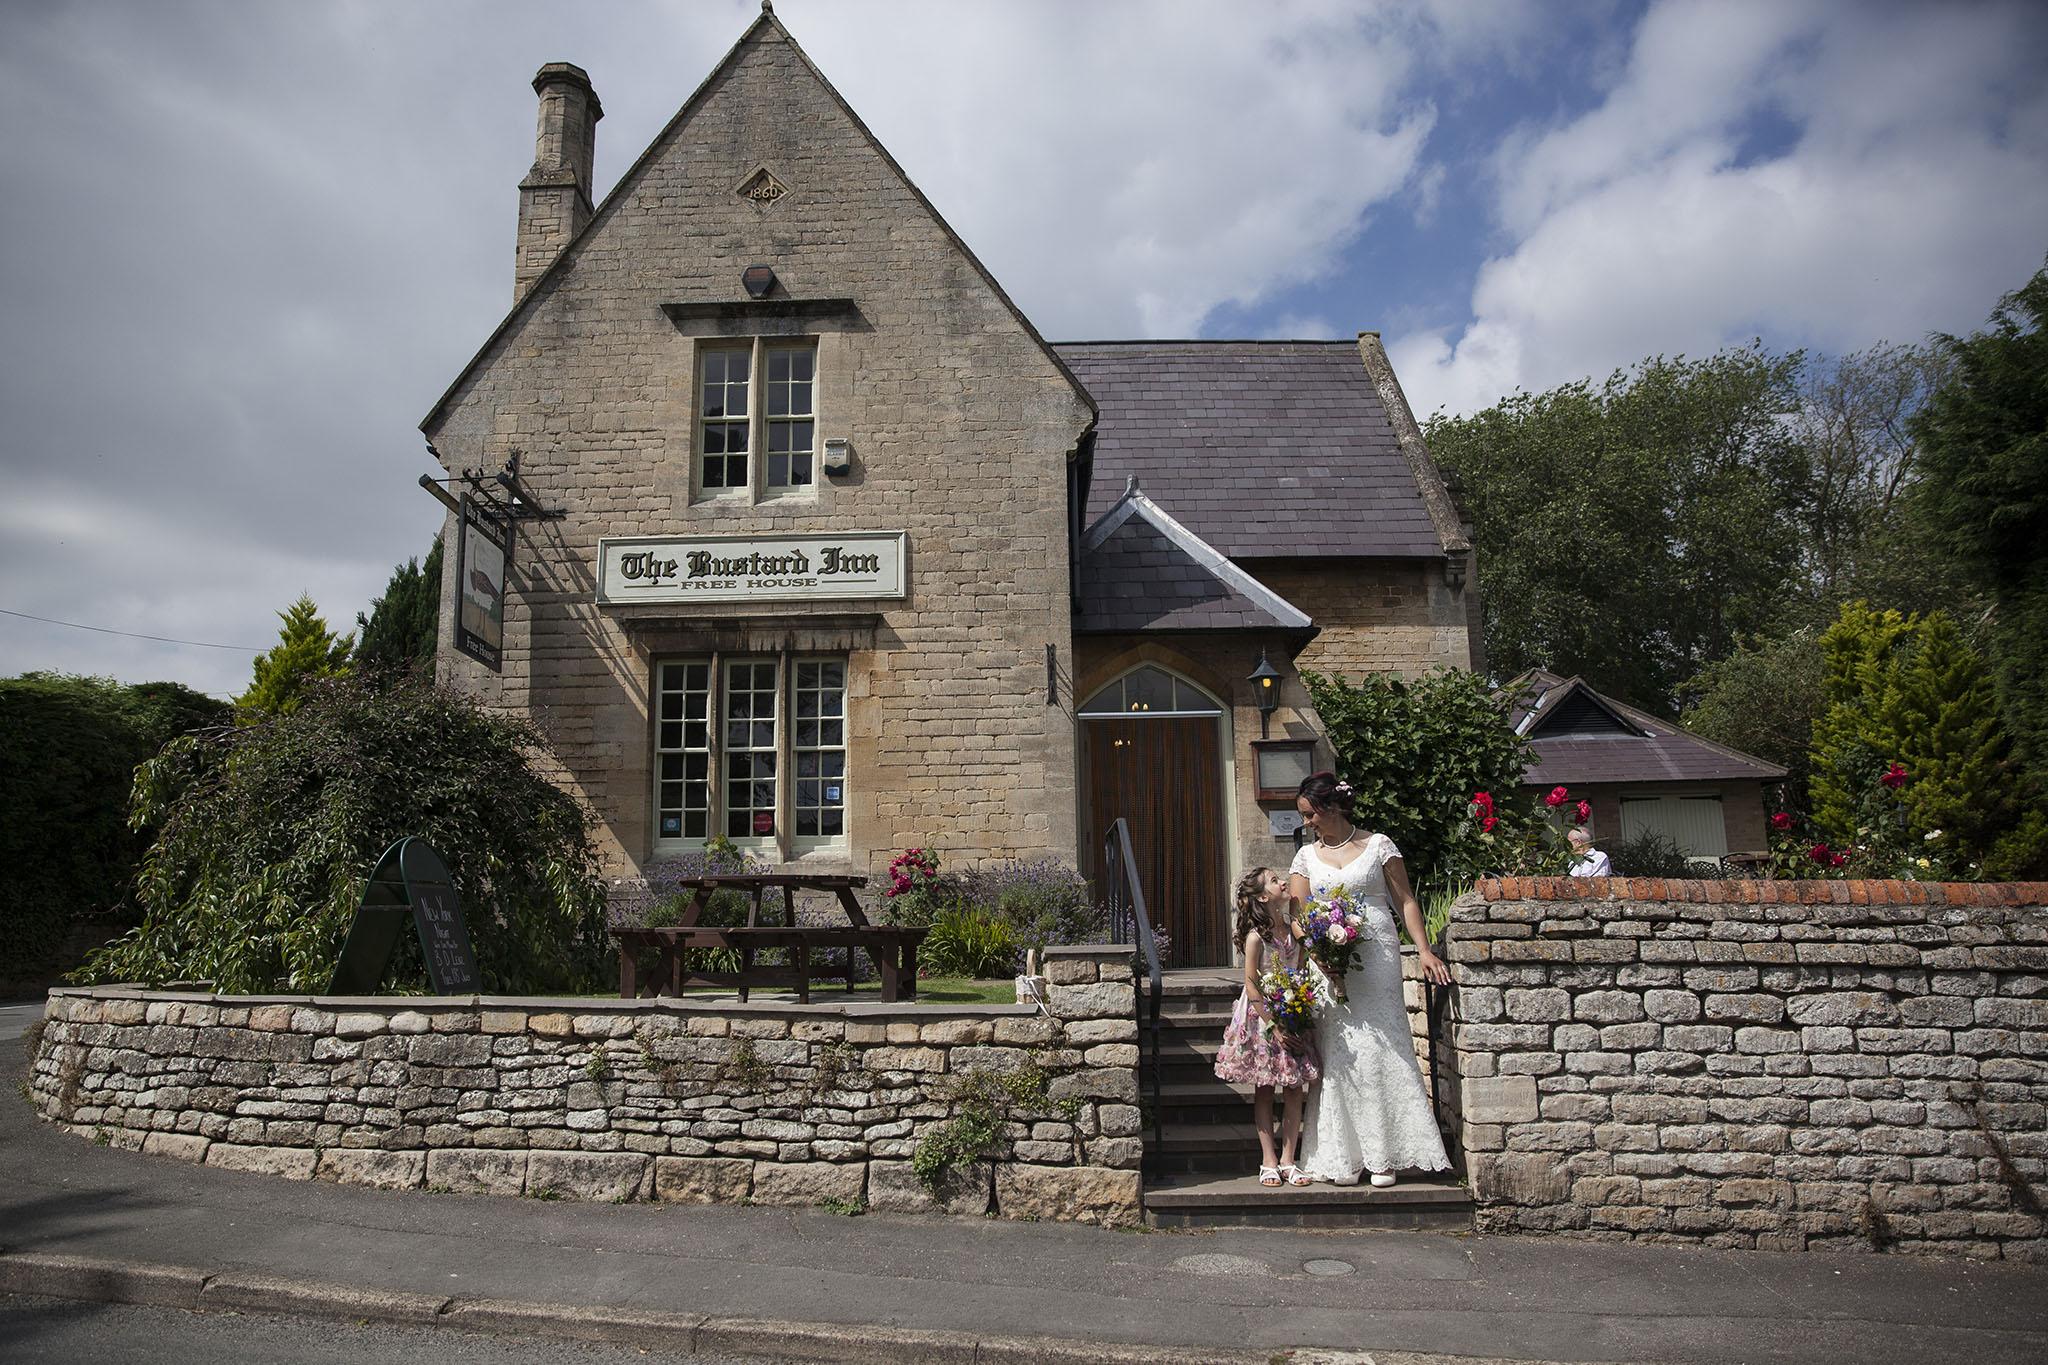 elizabethgphotography_kingslangley_hertfordshire_fineart_wedding_photography_lincolnshire_anna_simon_14.jpg